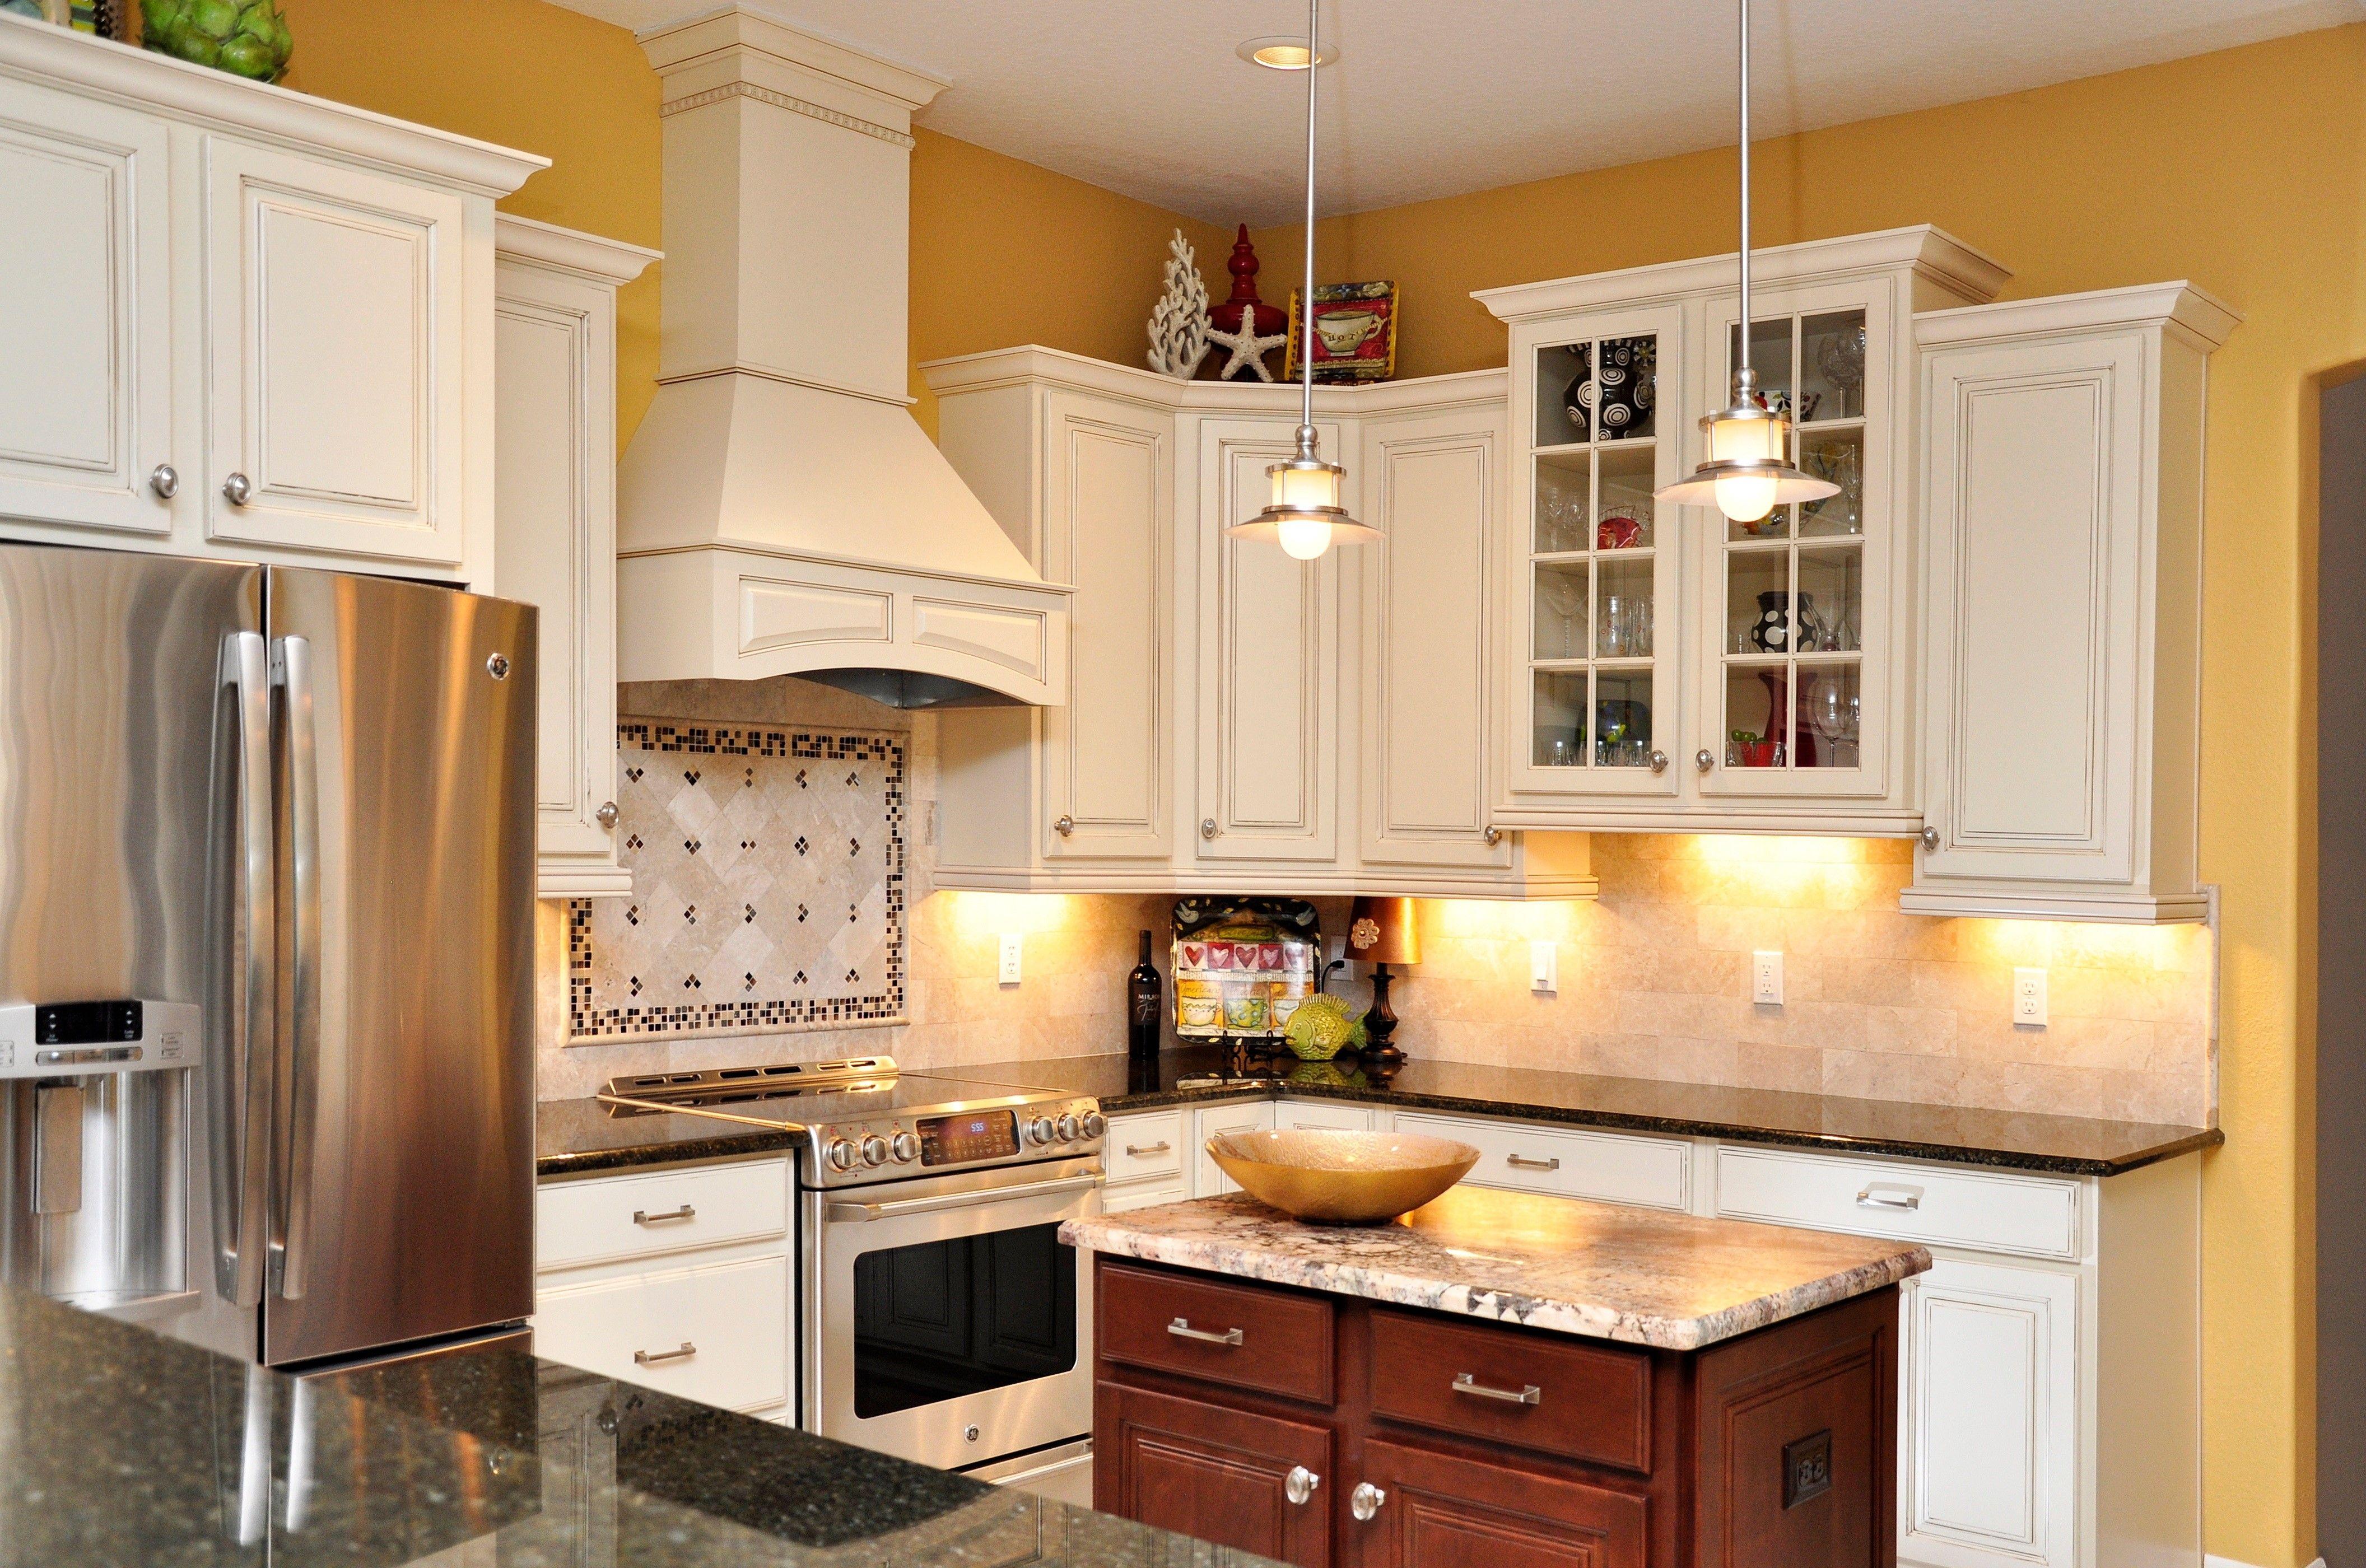 yellow kitchen appliances pendant white cabinets dark granite stainless steel